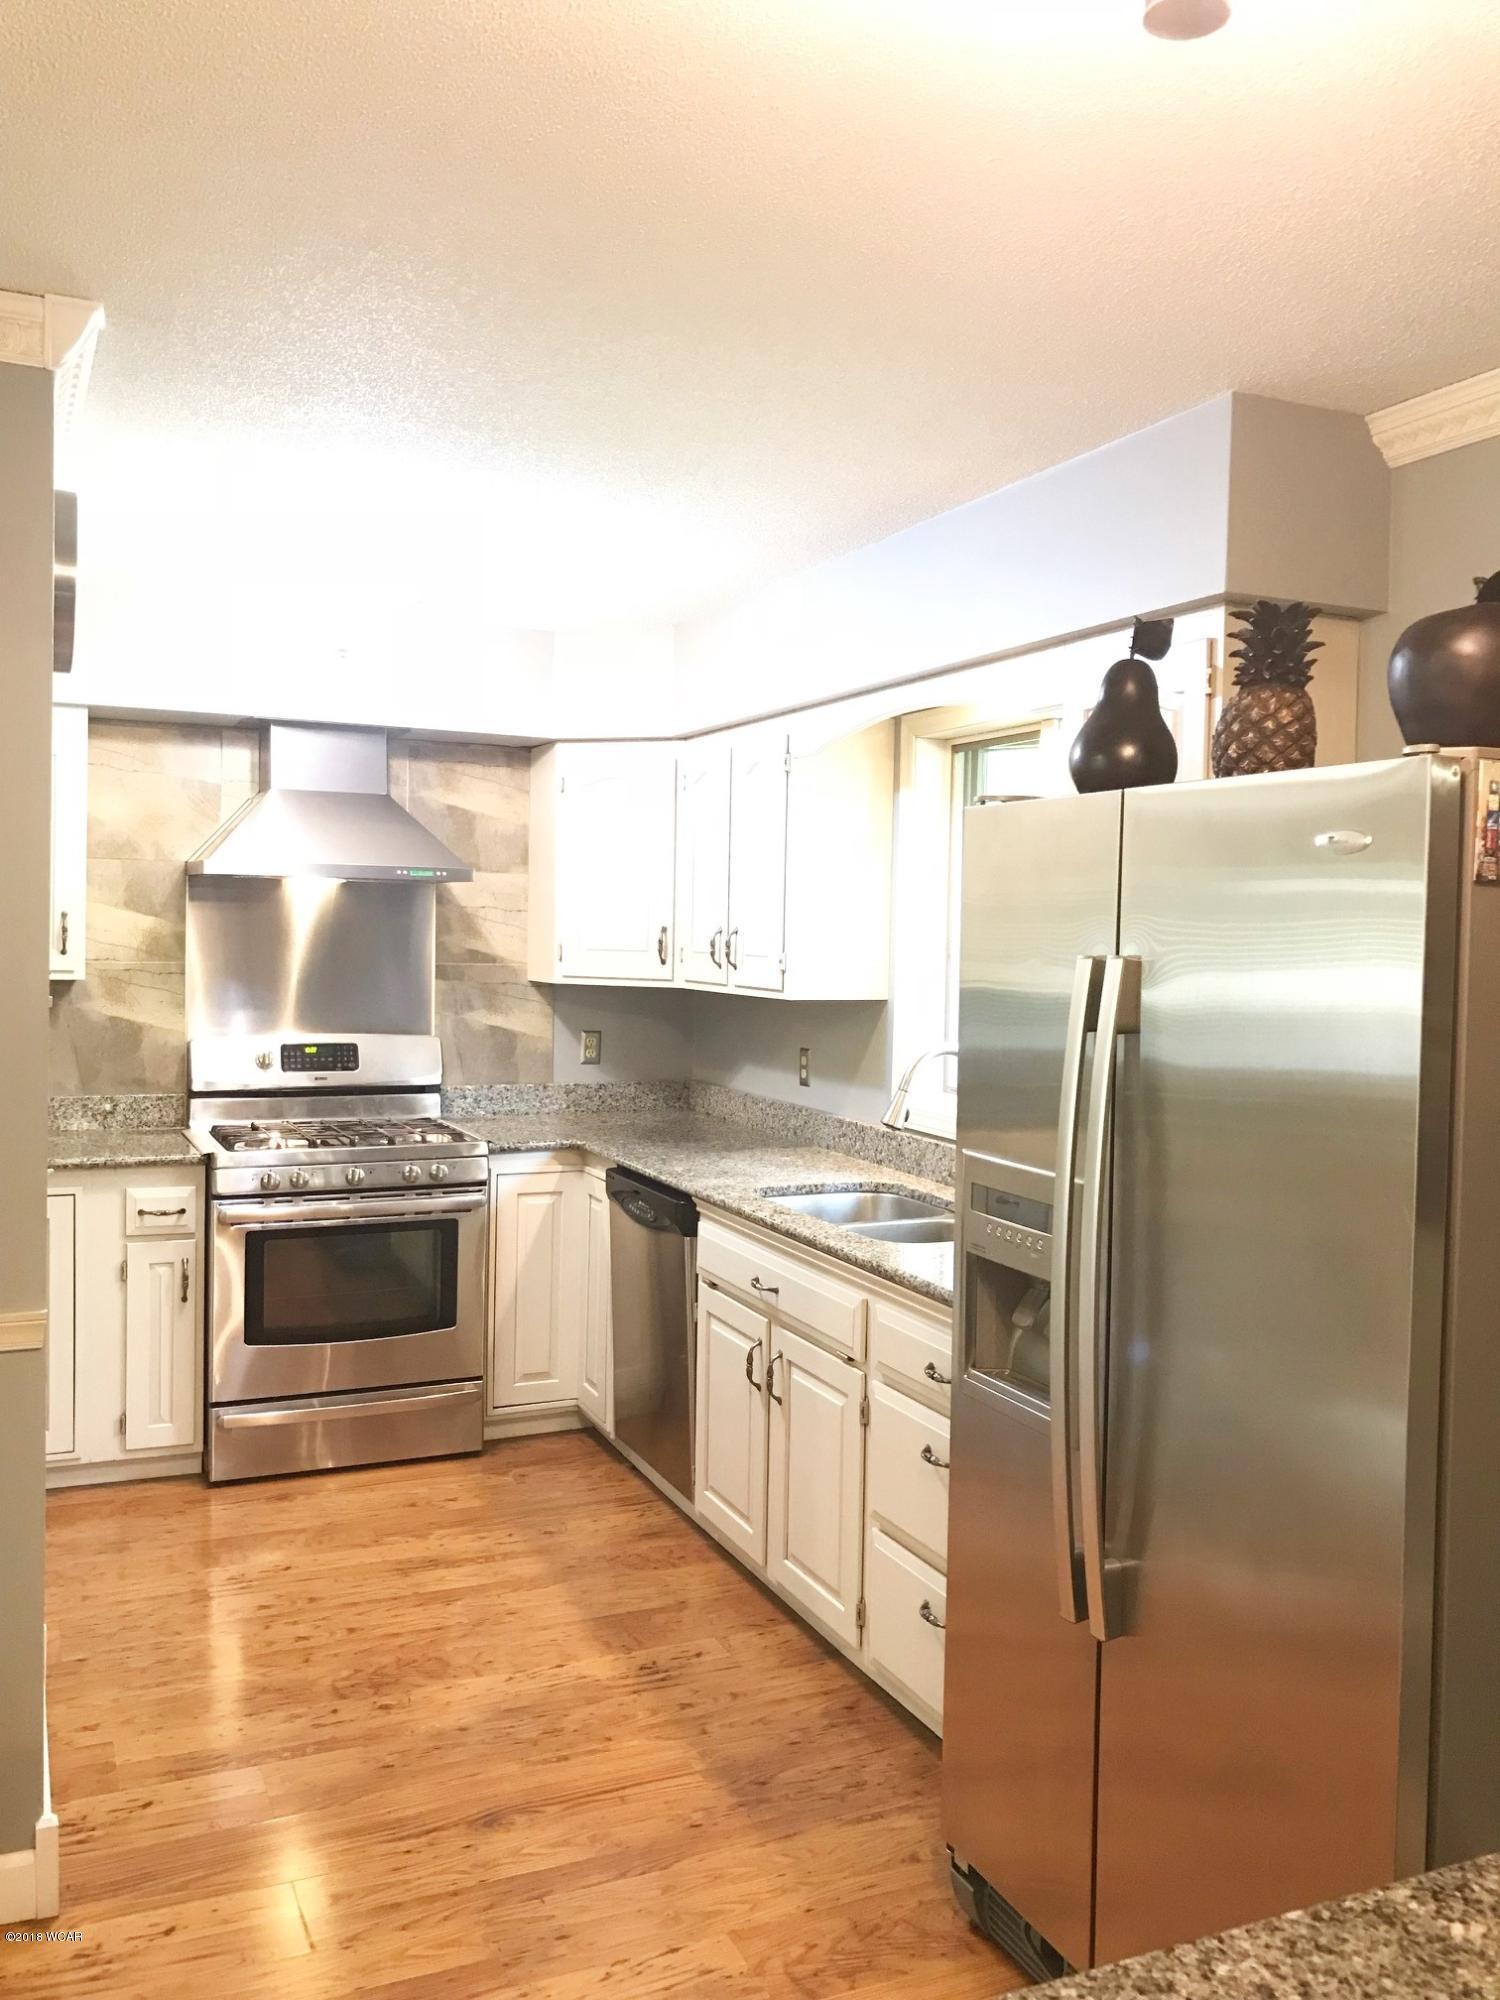 500 21 Street,Willmar,4 Bedrooms Bedrooms,3 BathroomsBathrooms,Single Family,21 Street,6032389